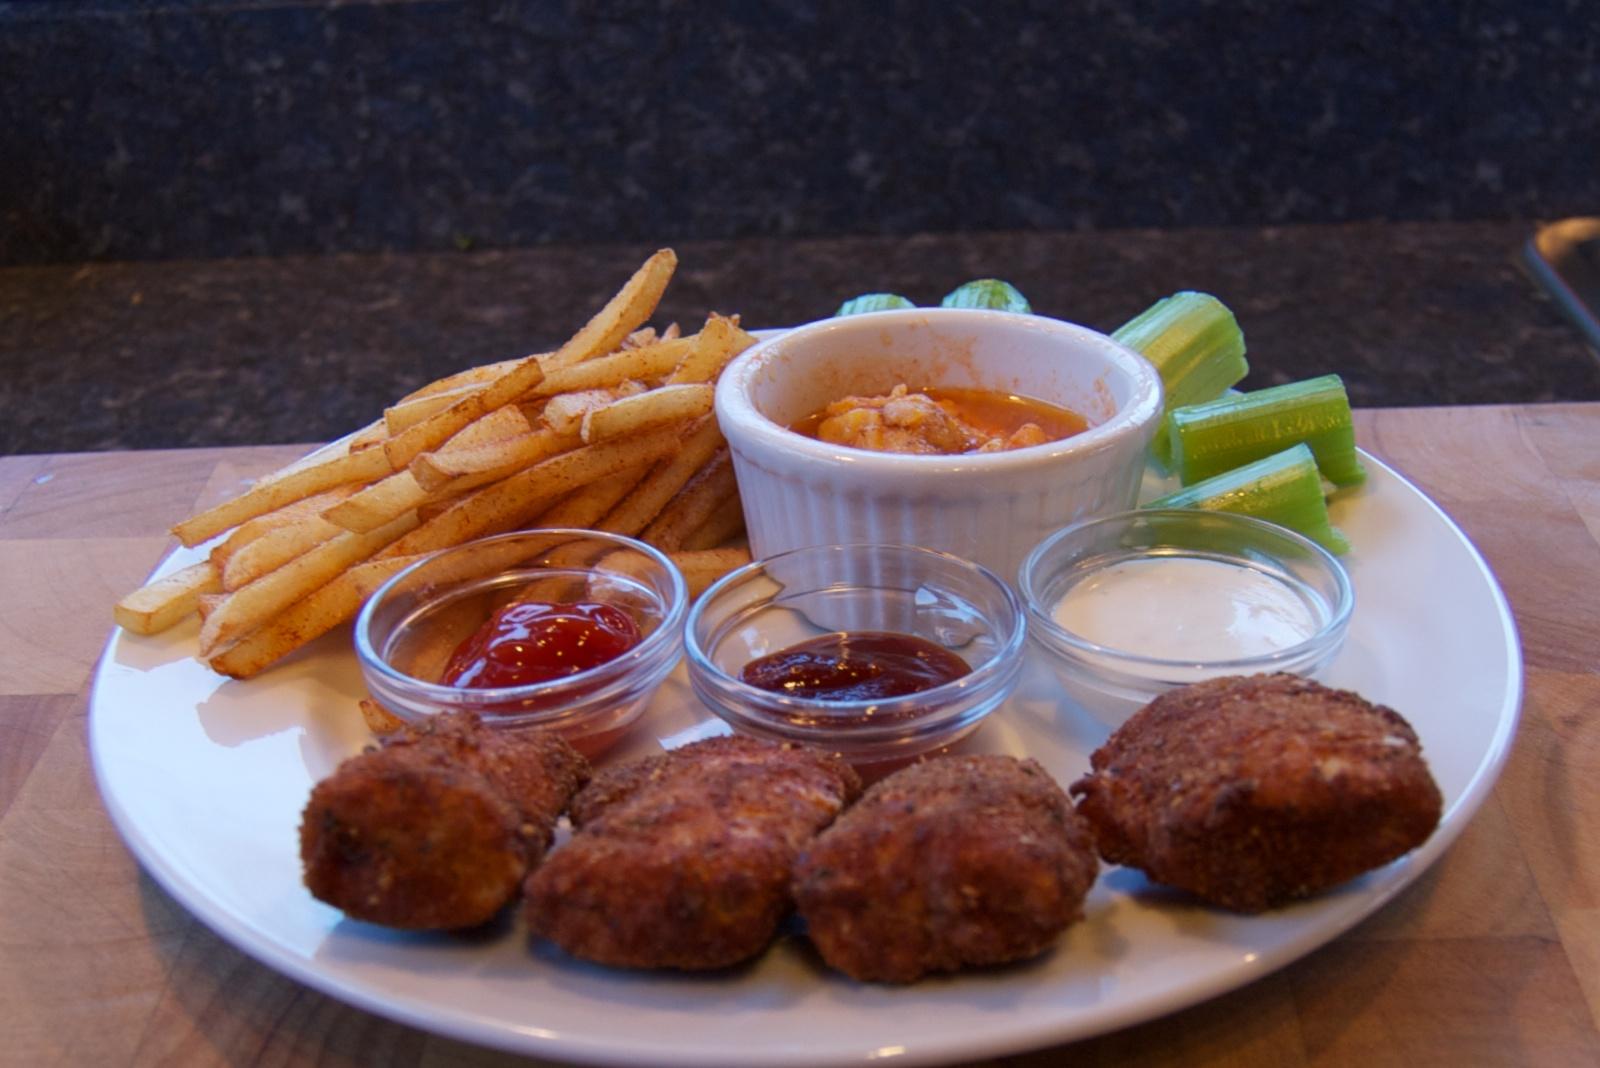 http://blog.rickk.com/food/2012/01/20/ate.2012.01.20.d.jpg